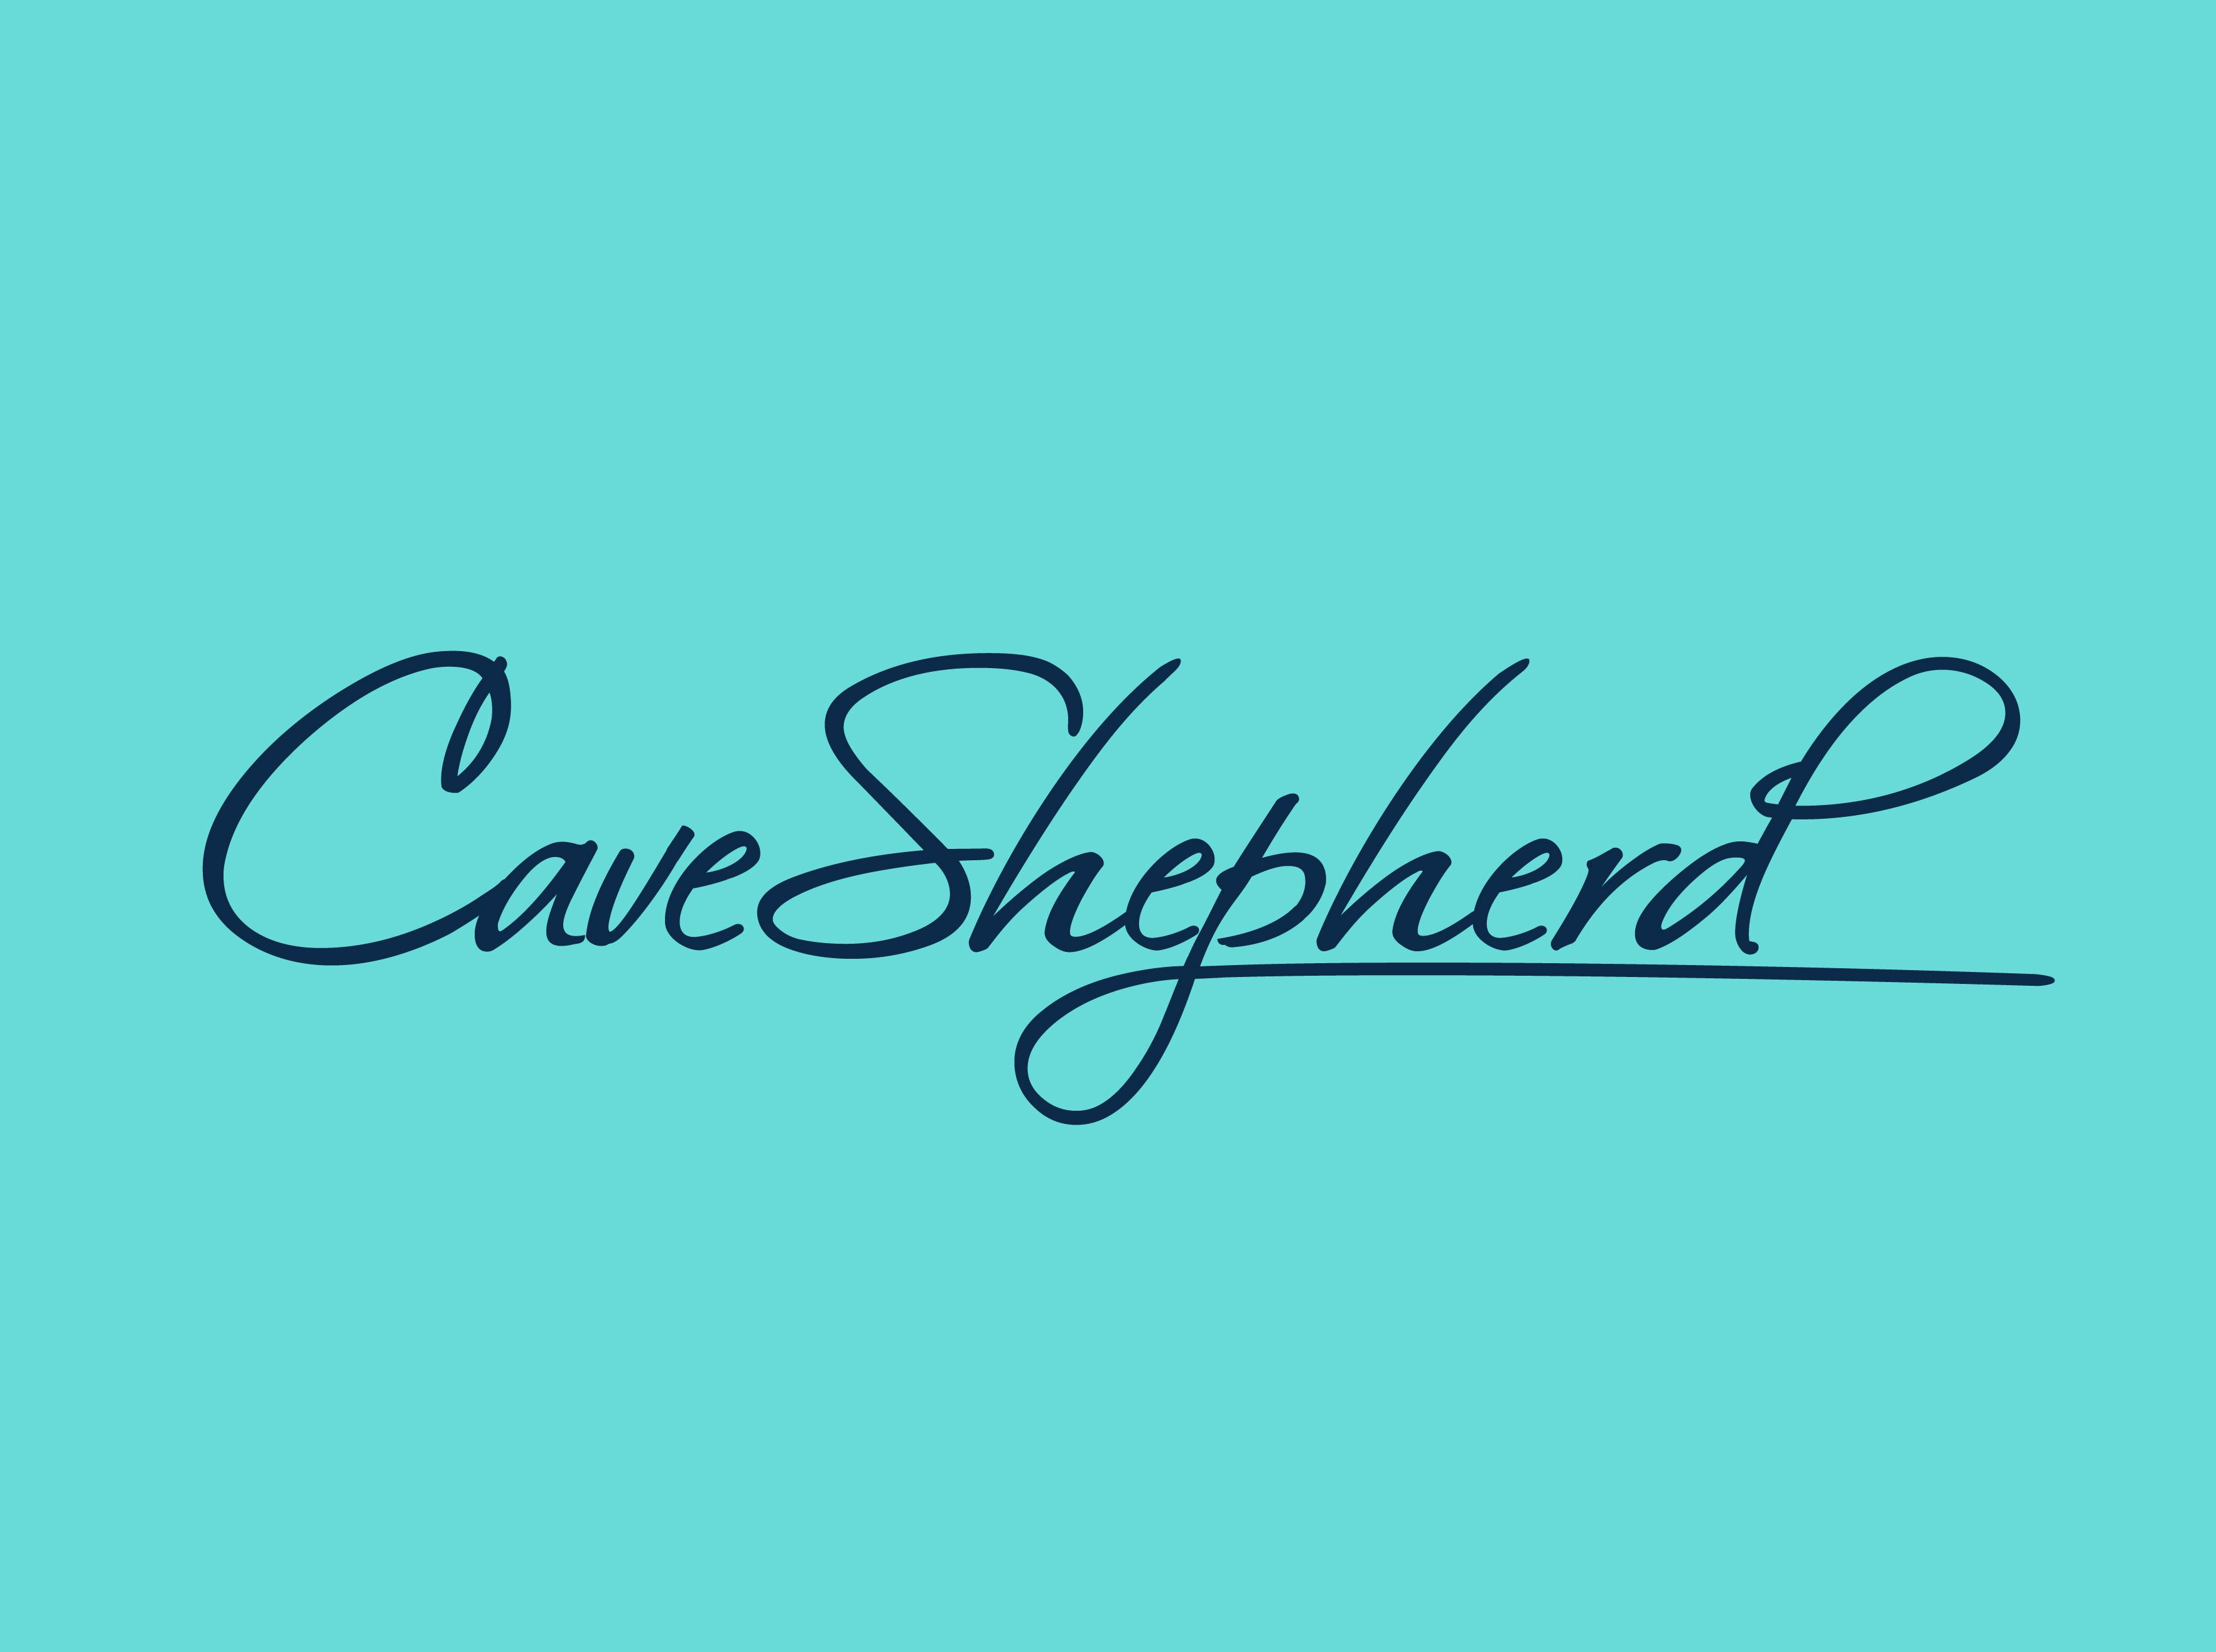 Cave Shepherd